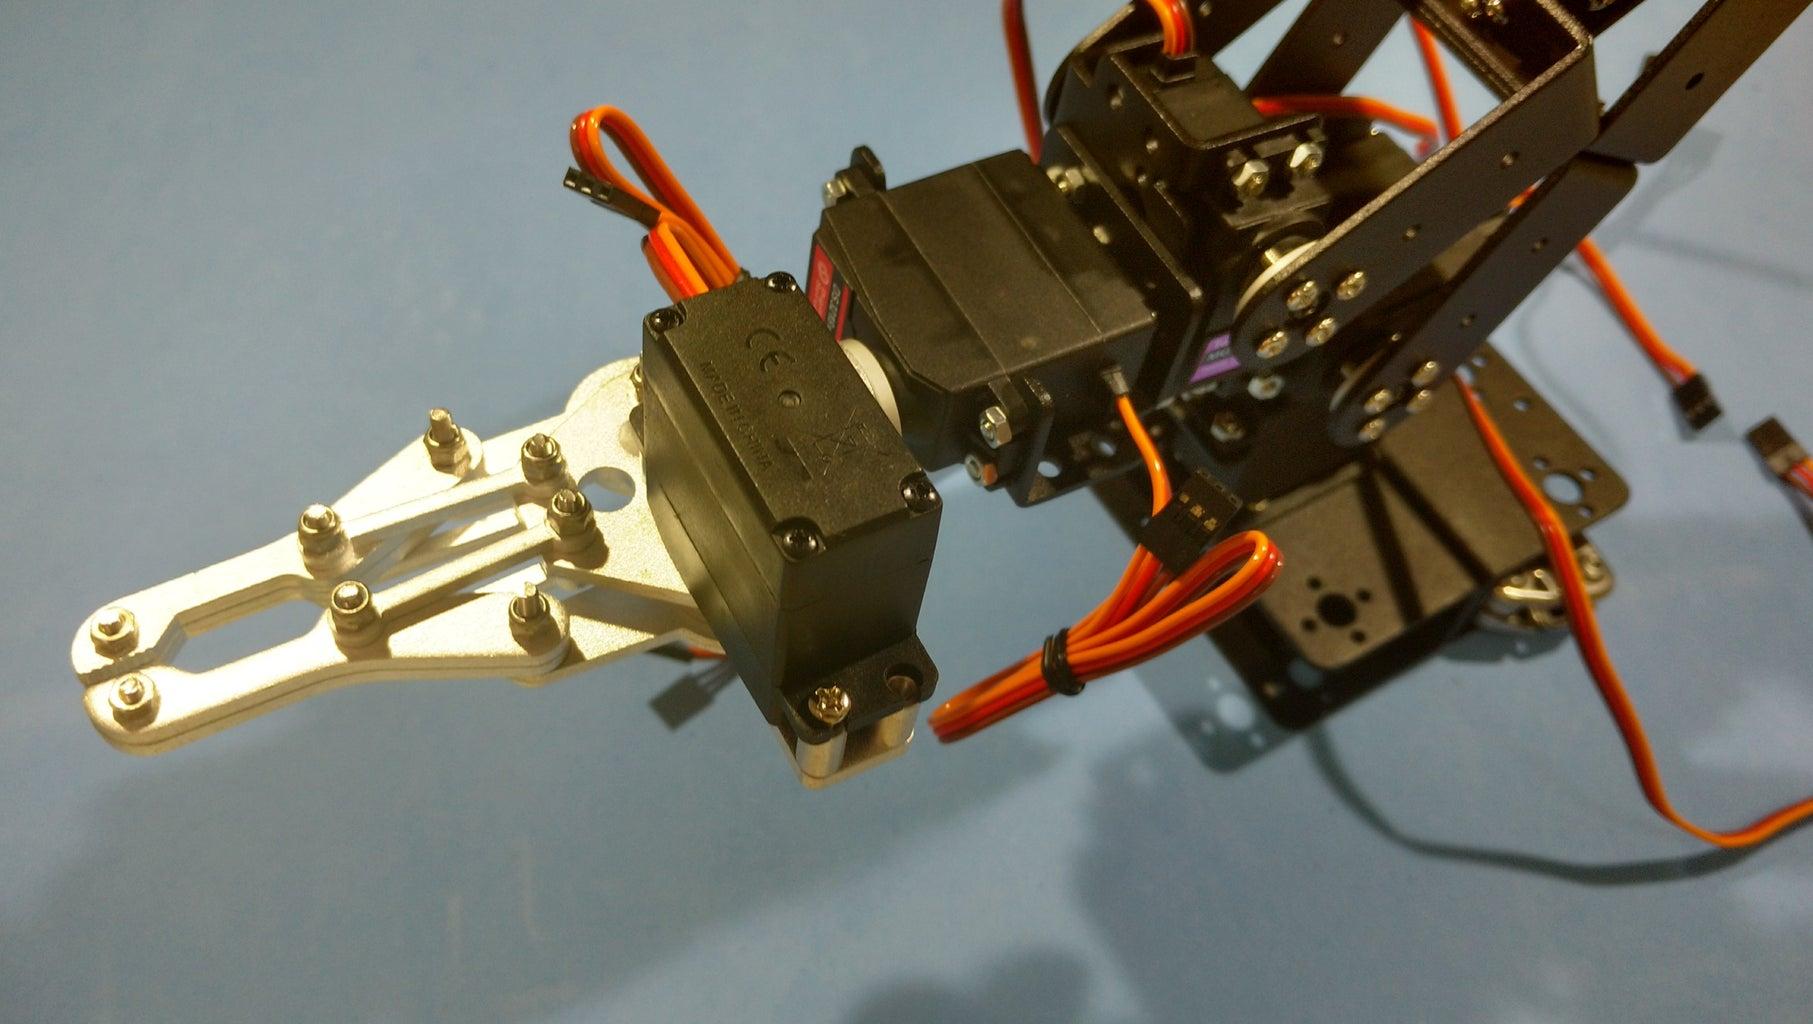 Assembling the Robotic Arm Pt7 - Servo #6